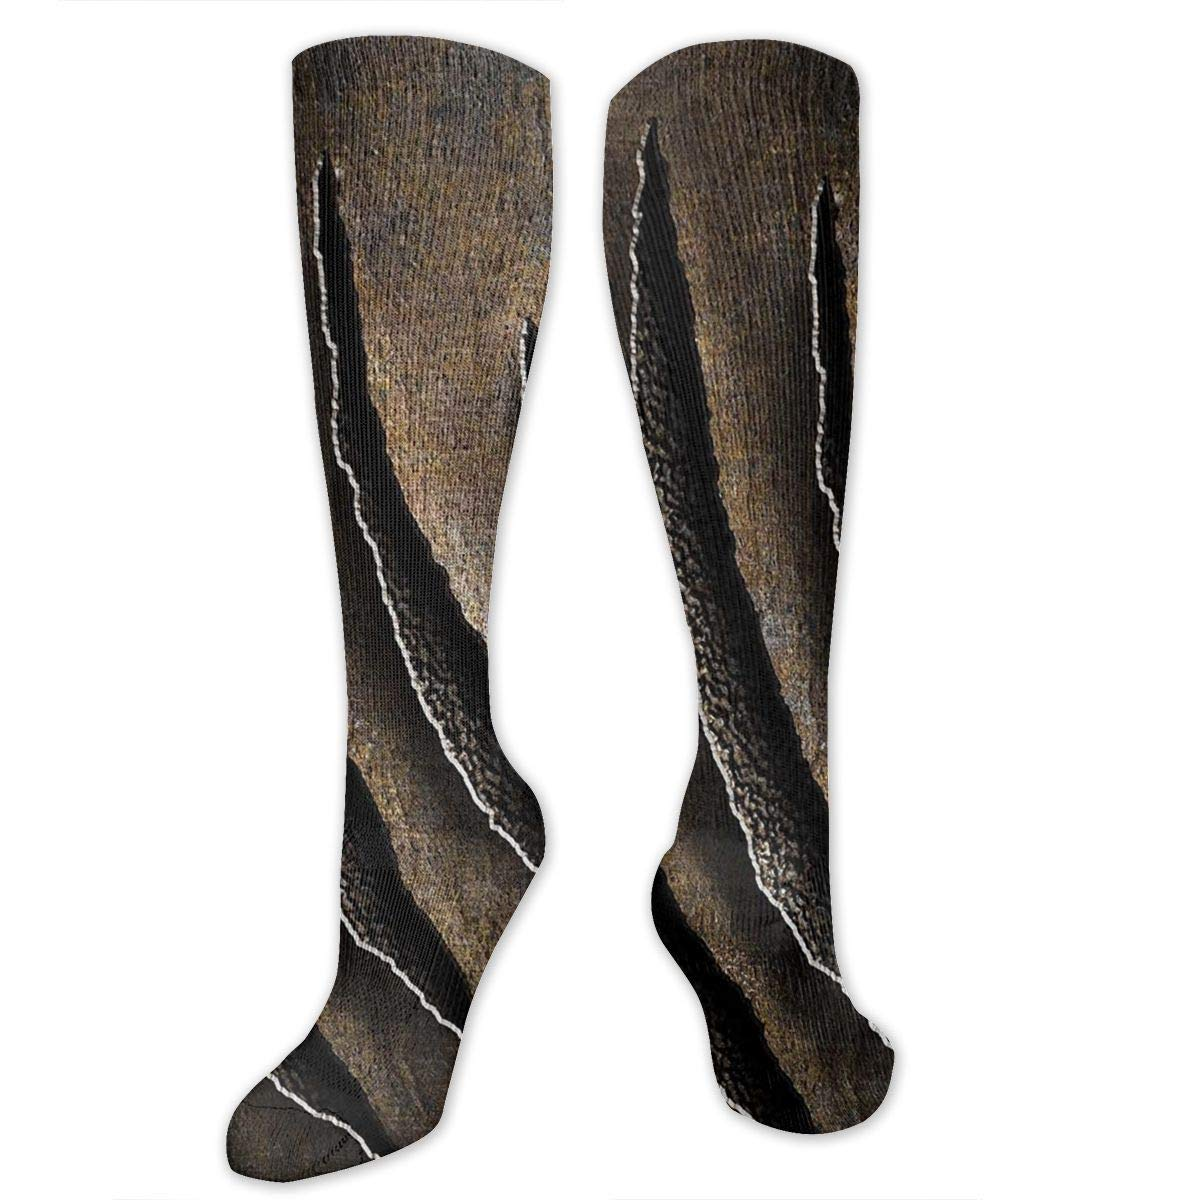 Chanwazibibiliu Wild Claws Sctrach Damage Mens Colorful Dress Socks Funky Men Multicolored Pattern Fashionable Fun Crew Cotton Socks